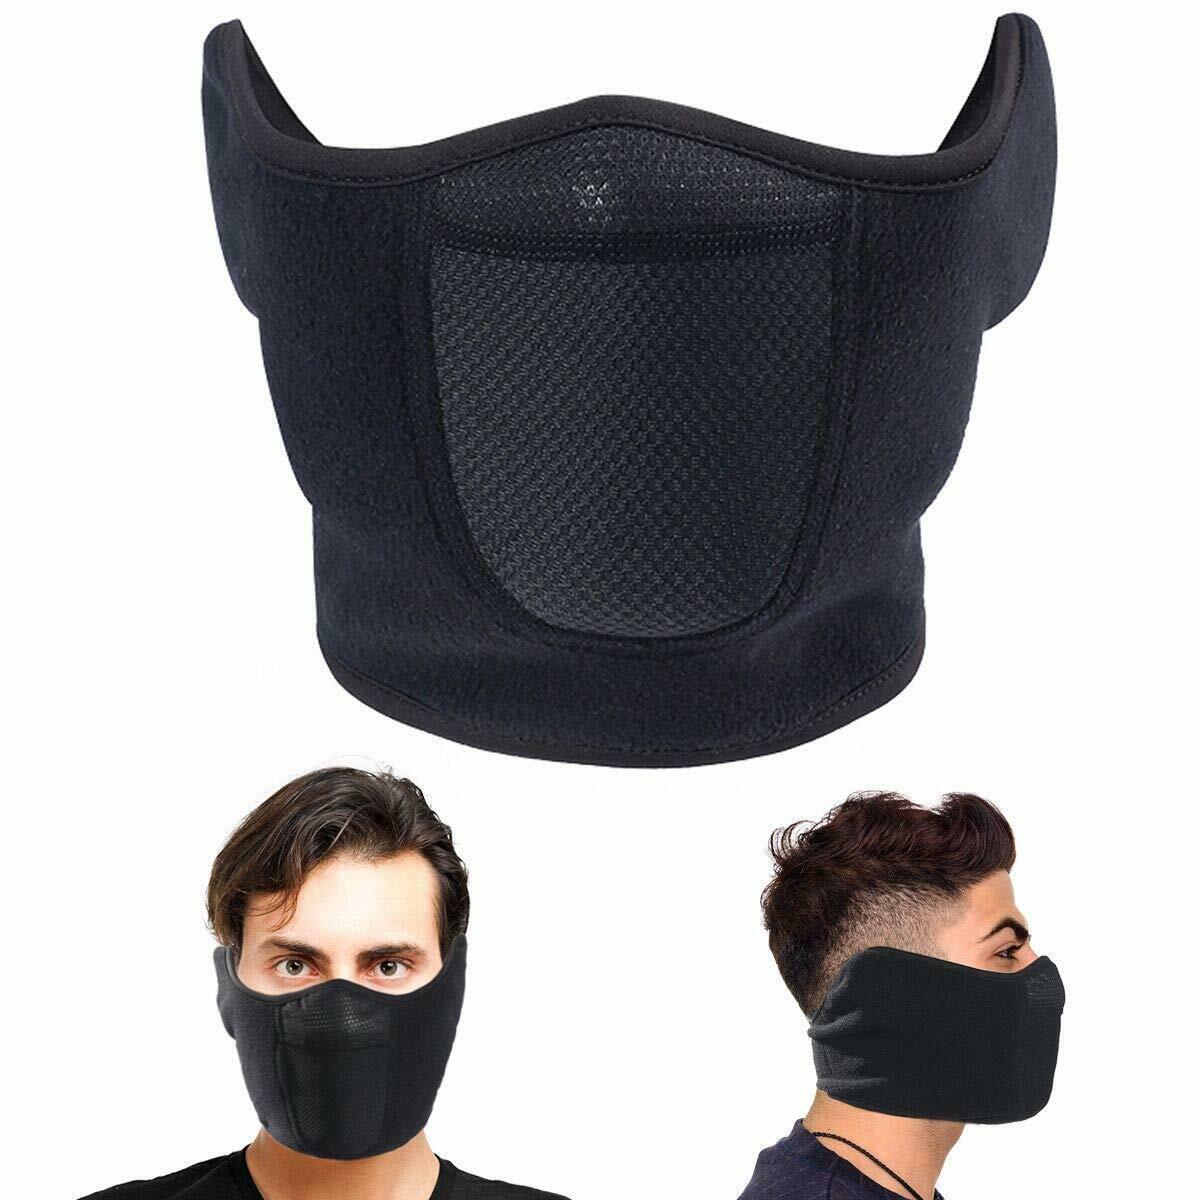 US STOCK Fleece Ski Half Face Cover Winter Ear Warmer Cycling Skiinig Snowboard Masks for Men Women